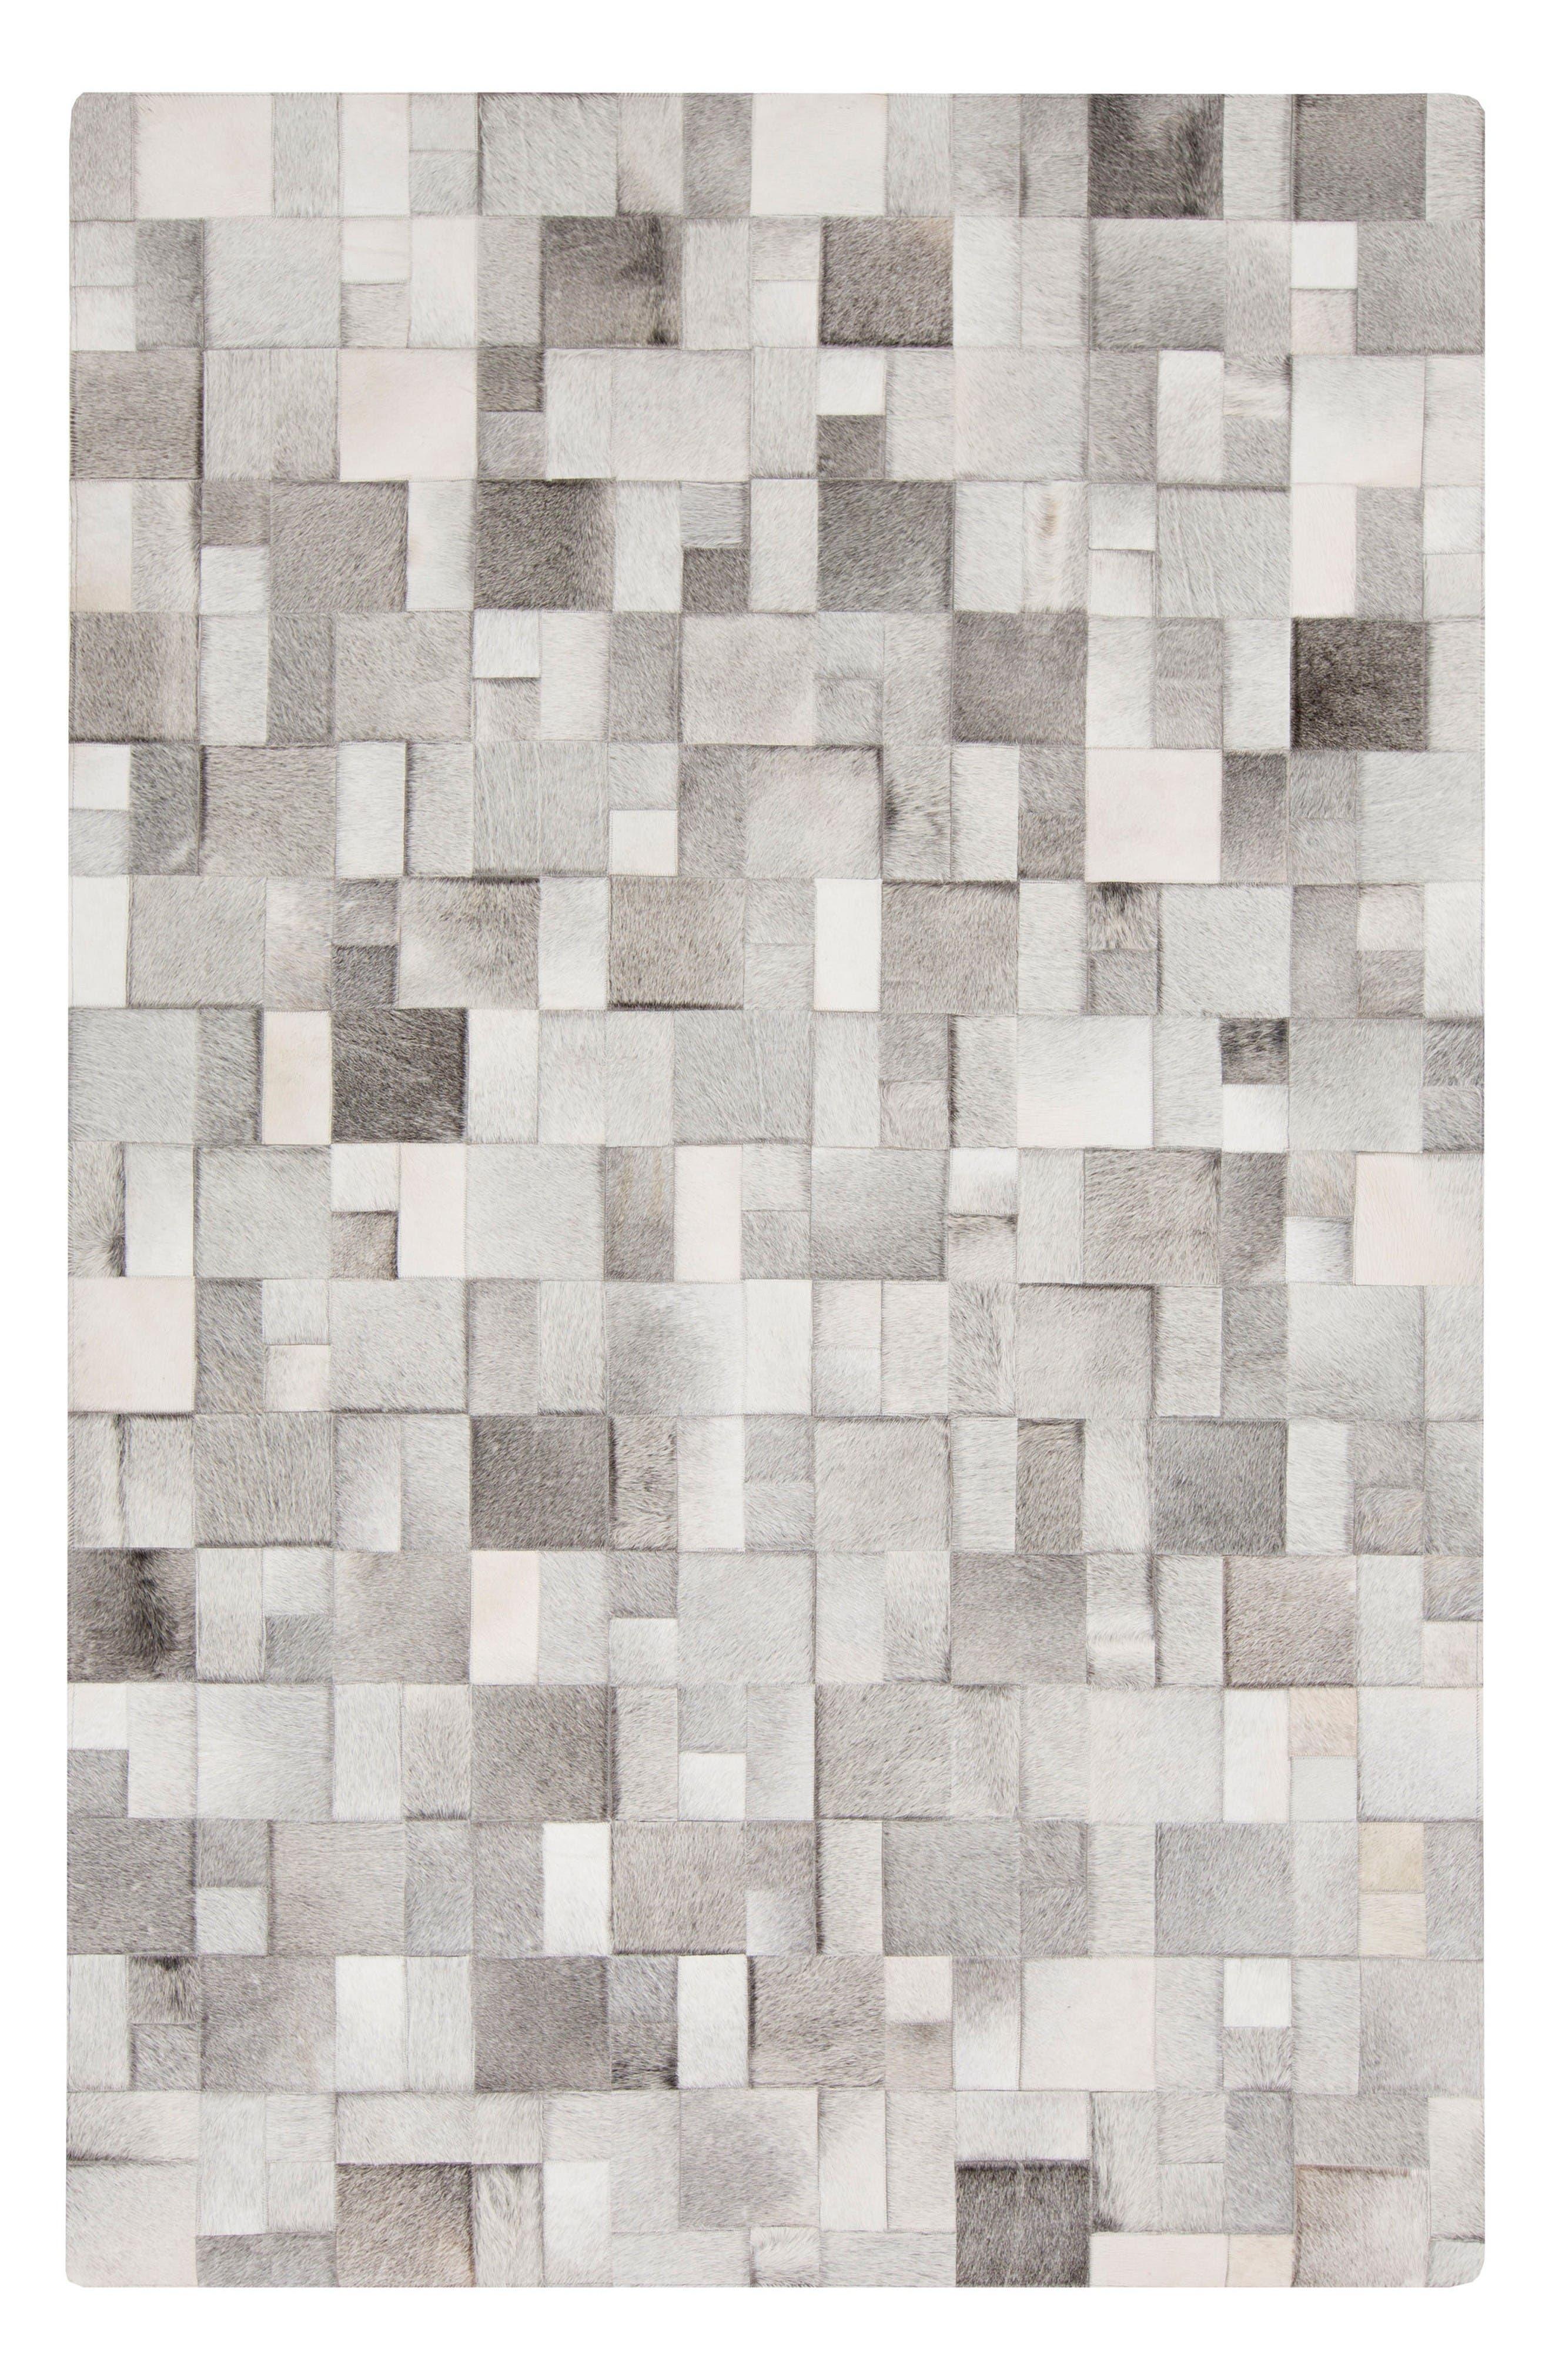 Outback Blurred Bricks Calf Hair Rug,                             Main thumbnail 1, color,                             Grey